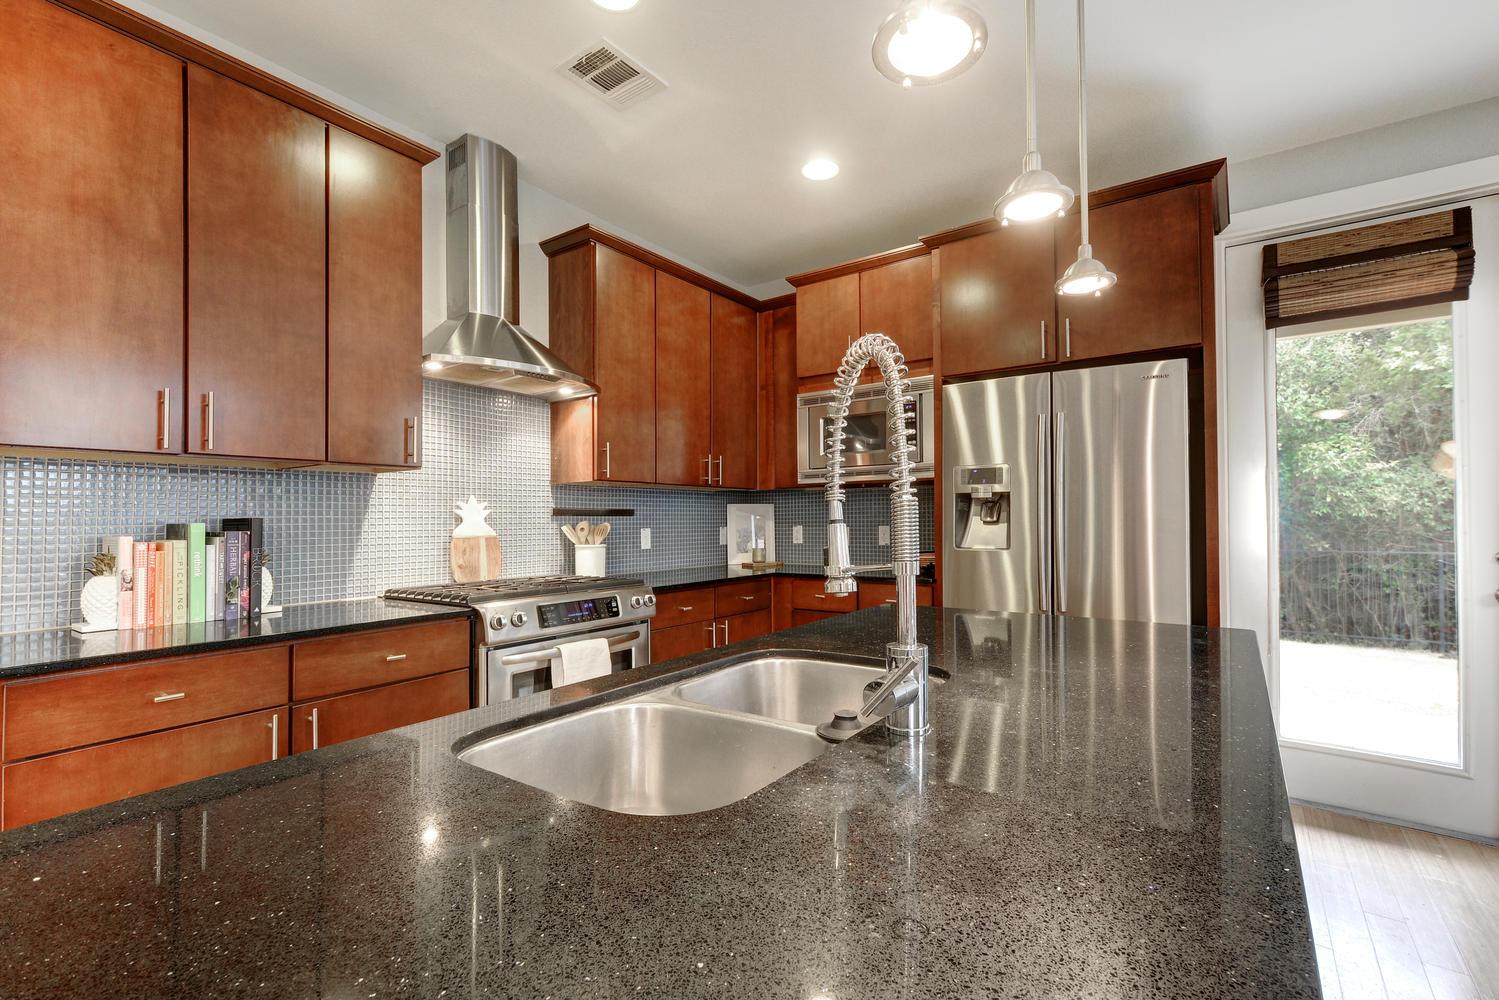 2909 Corbin Ln-large-012-21-Kitchen 005-1499x1000-72dpi.jpg